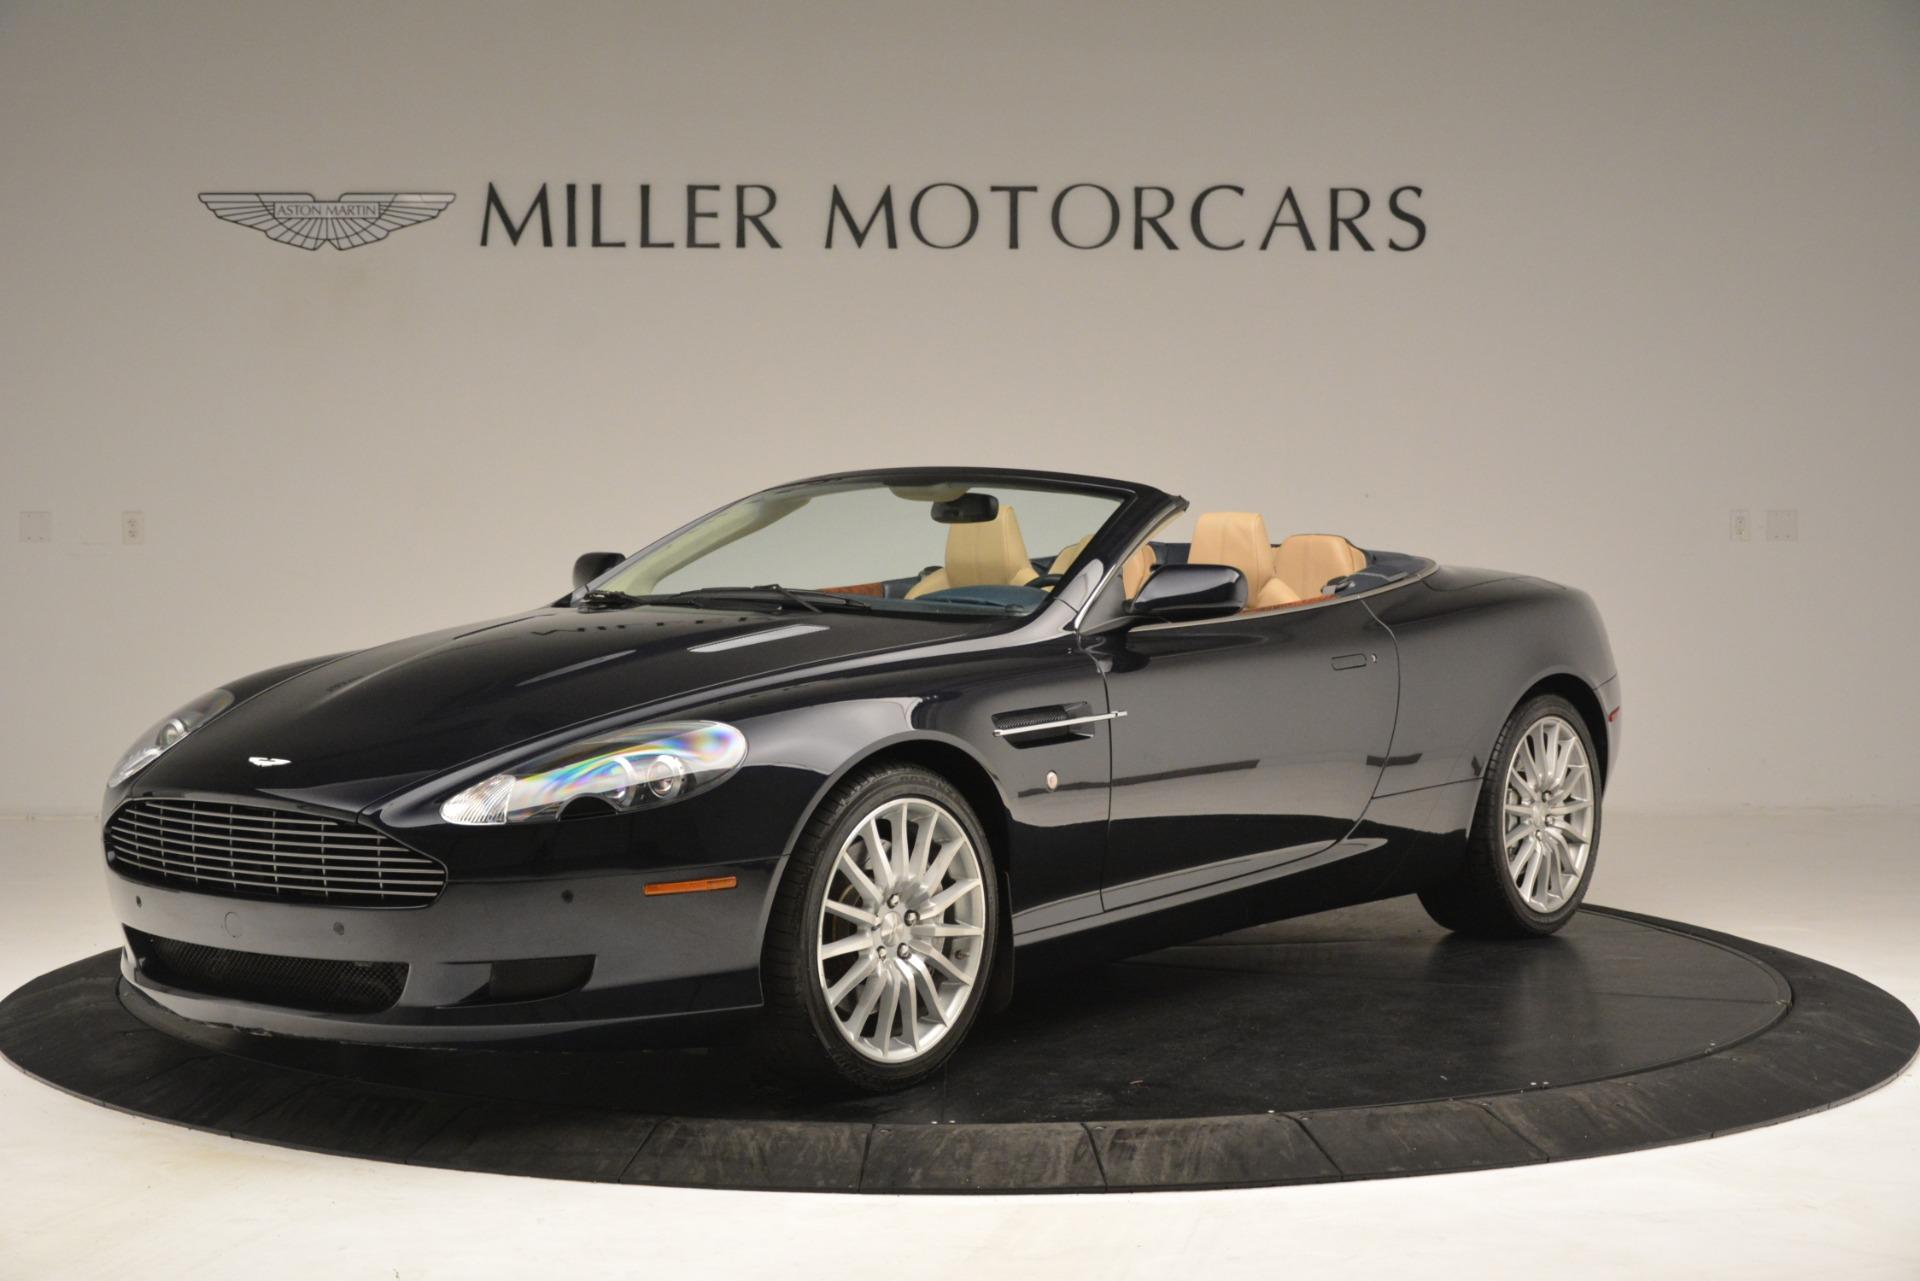 Used 2007 Aston Martin DB9 Convertible for sale Sold at Alfa Romeo of Westport in Westport CT 06880 1